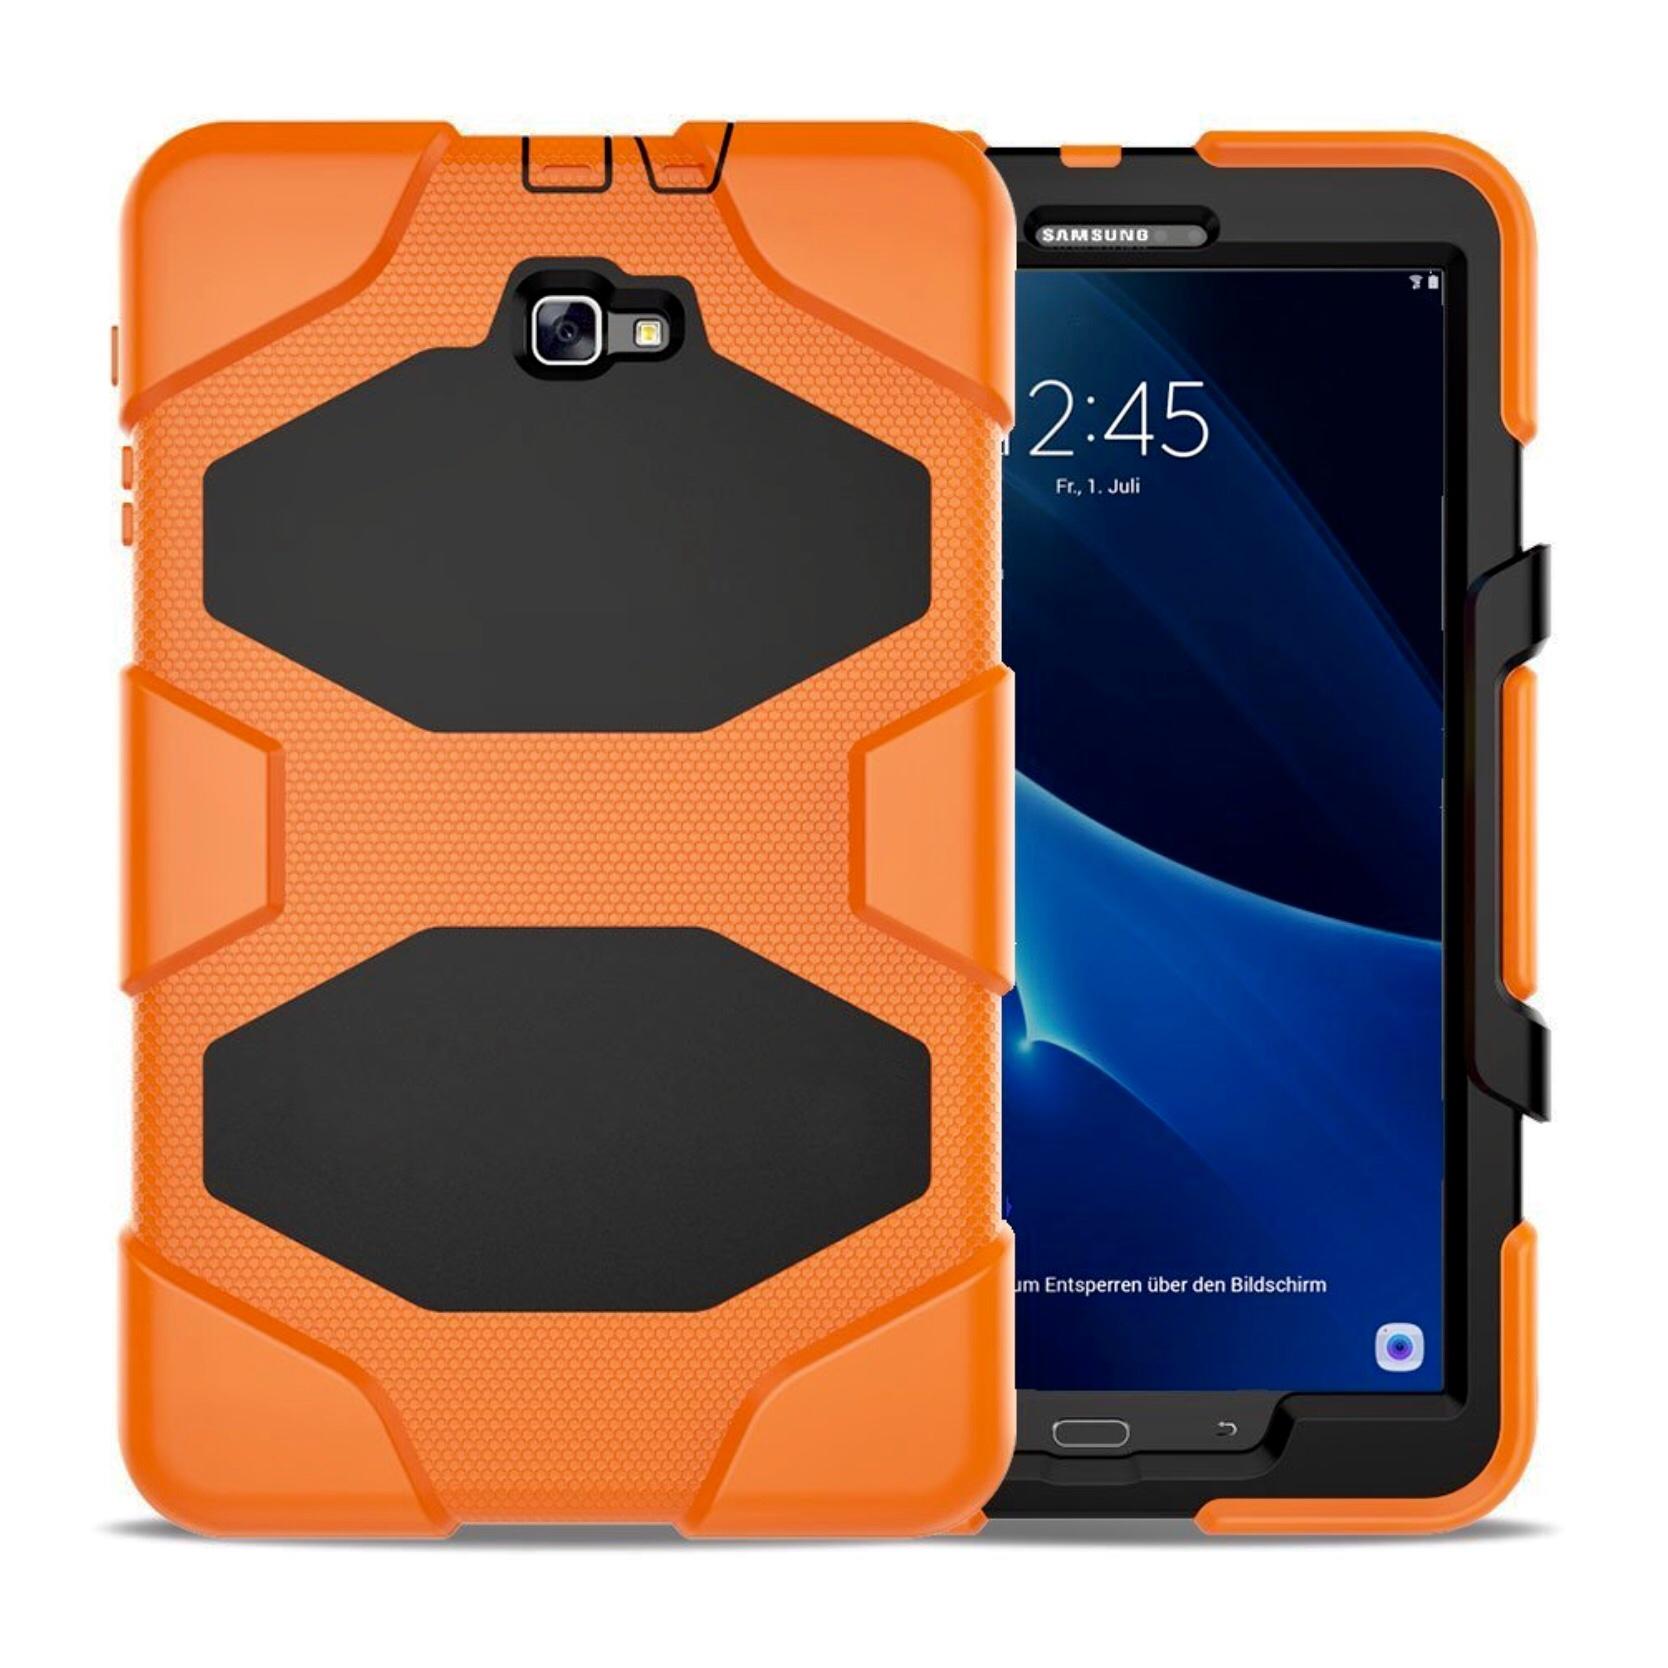 Coque Samsung Galaxy TAB A6 10.1 pouces Protection Vegas Orange